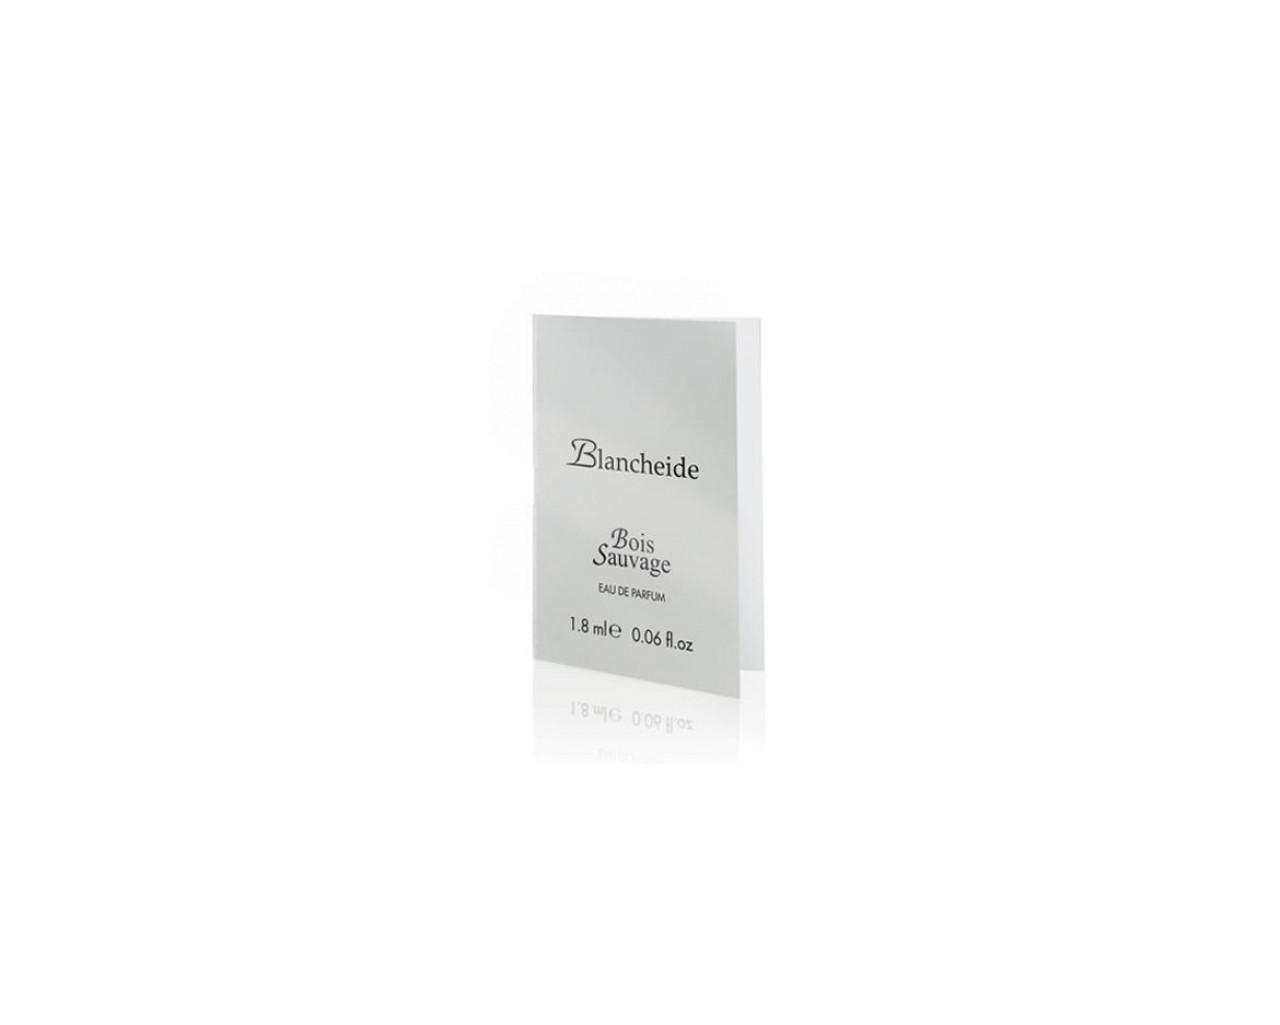 Campioncino Bois Sauvage Blancheide EDP 1,8 ml Blancheide BLAS001BS-03